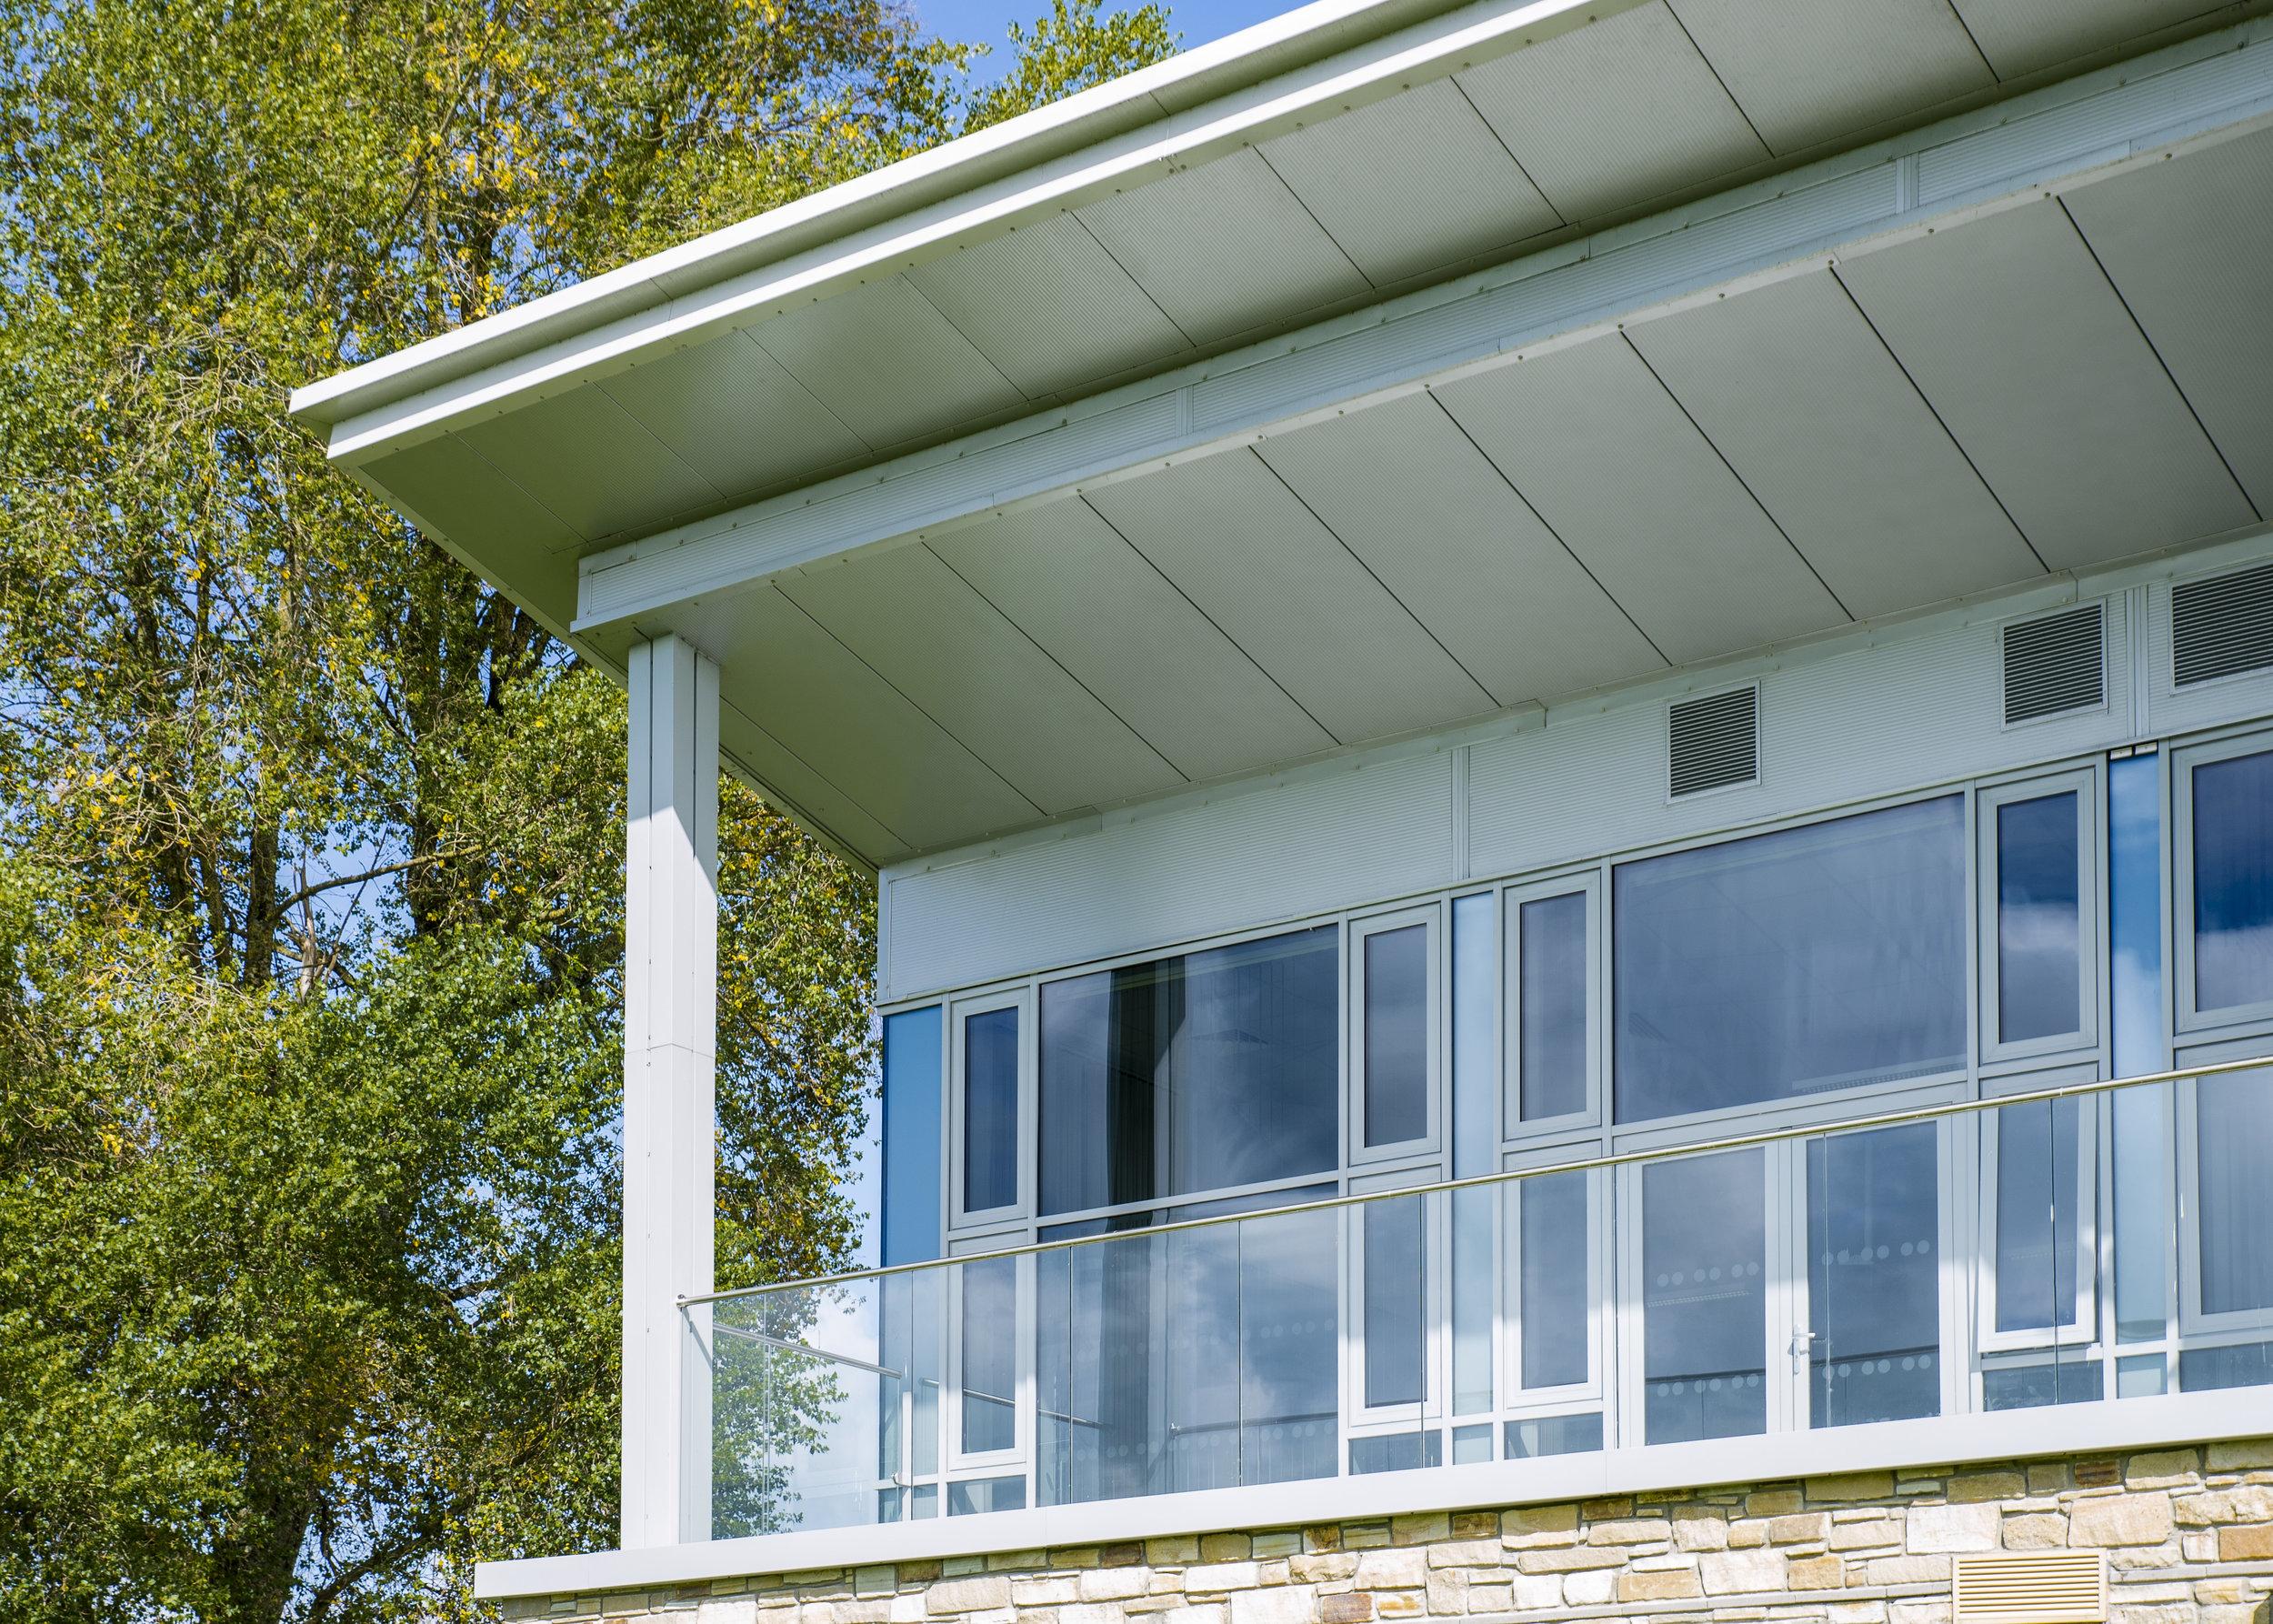 Paul_McAlister_Architects_Balcony.jpg